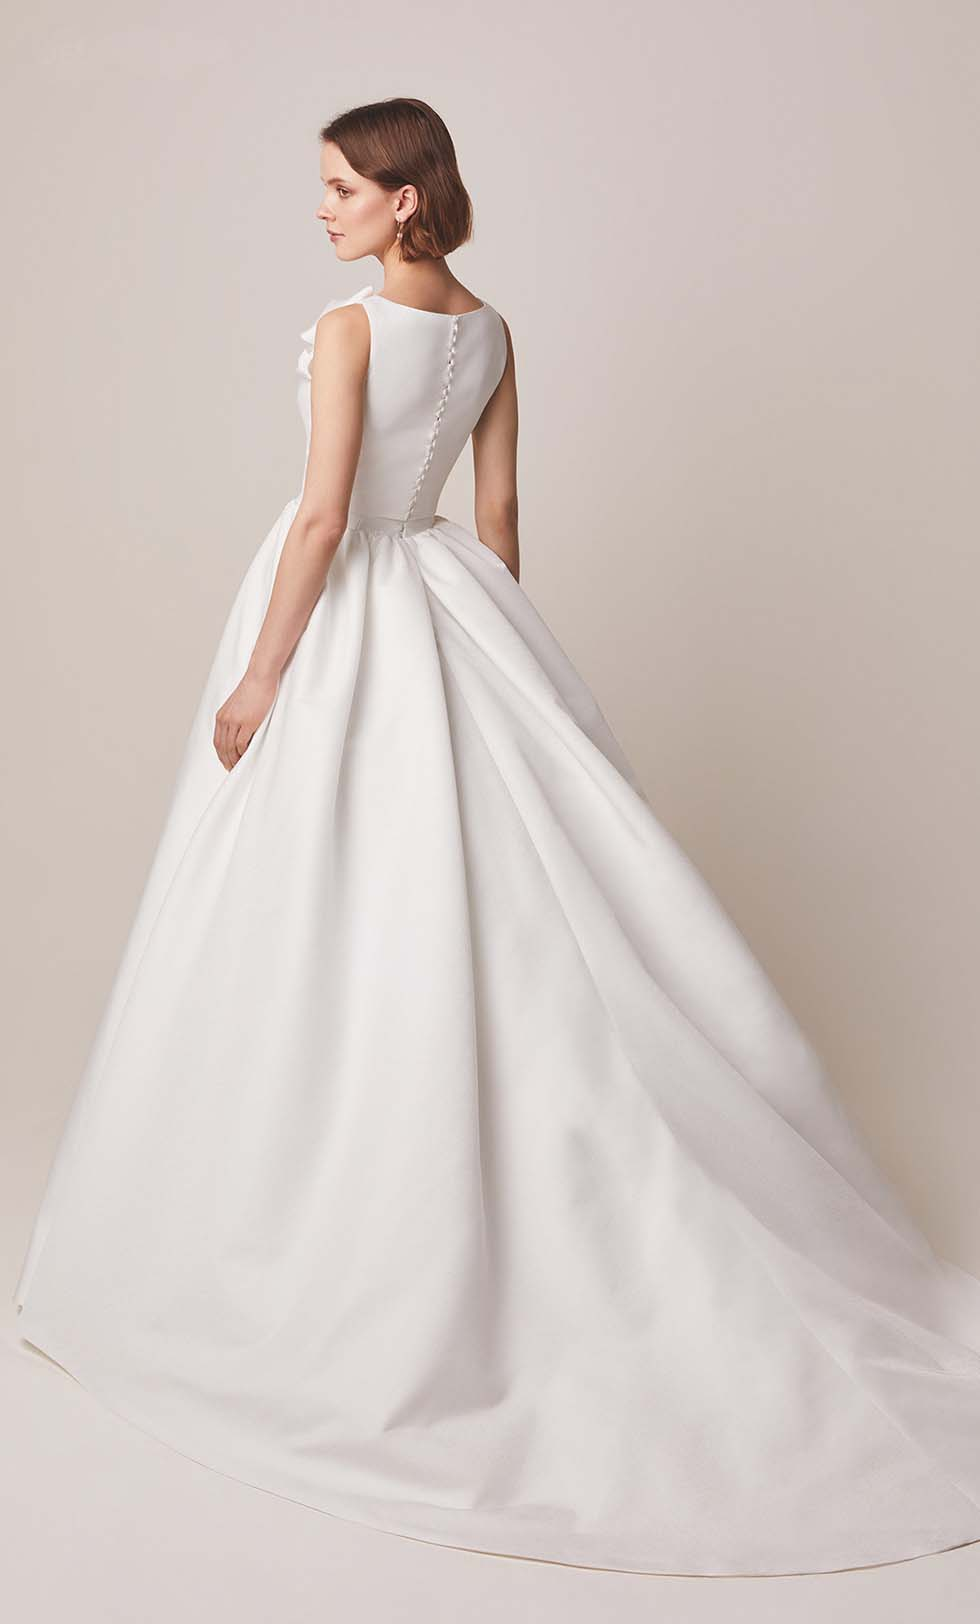 Brautkleid Prinzessin Stil Jesús Peiró